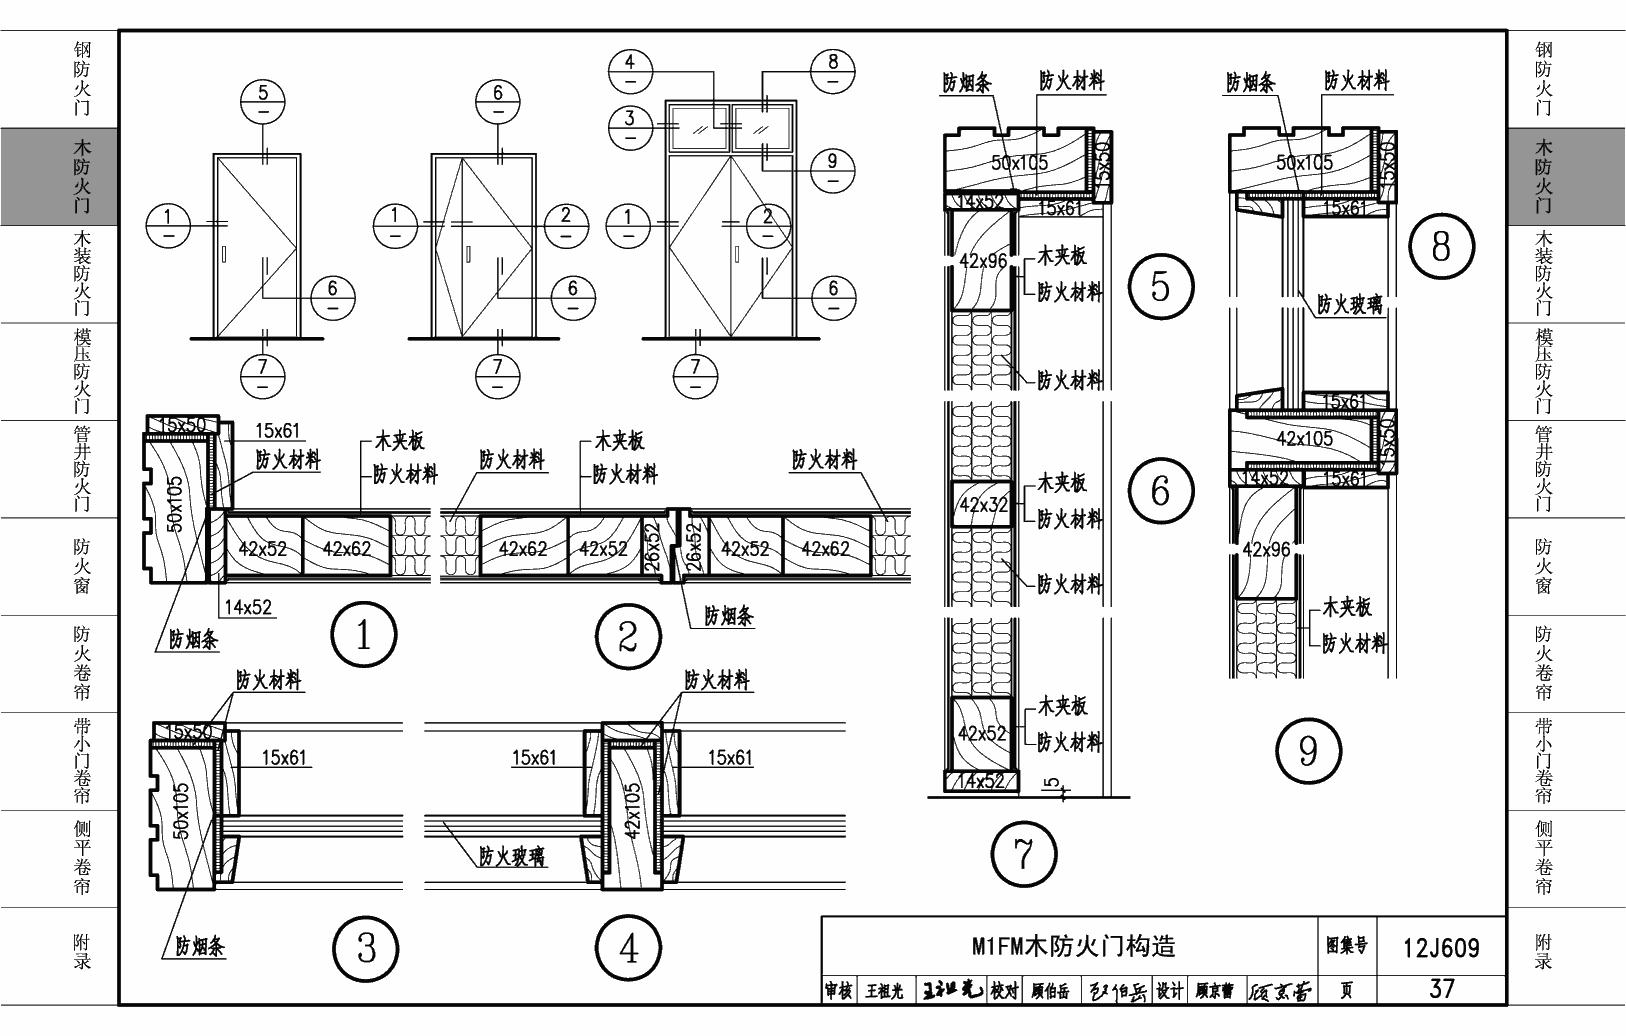 12J609:设计门窗-标准建筑国家防火网12x10米房屋农村设计图图片